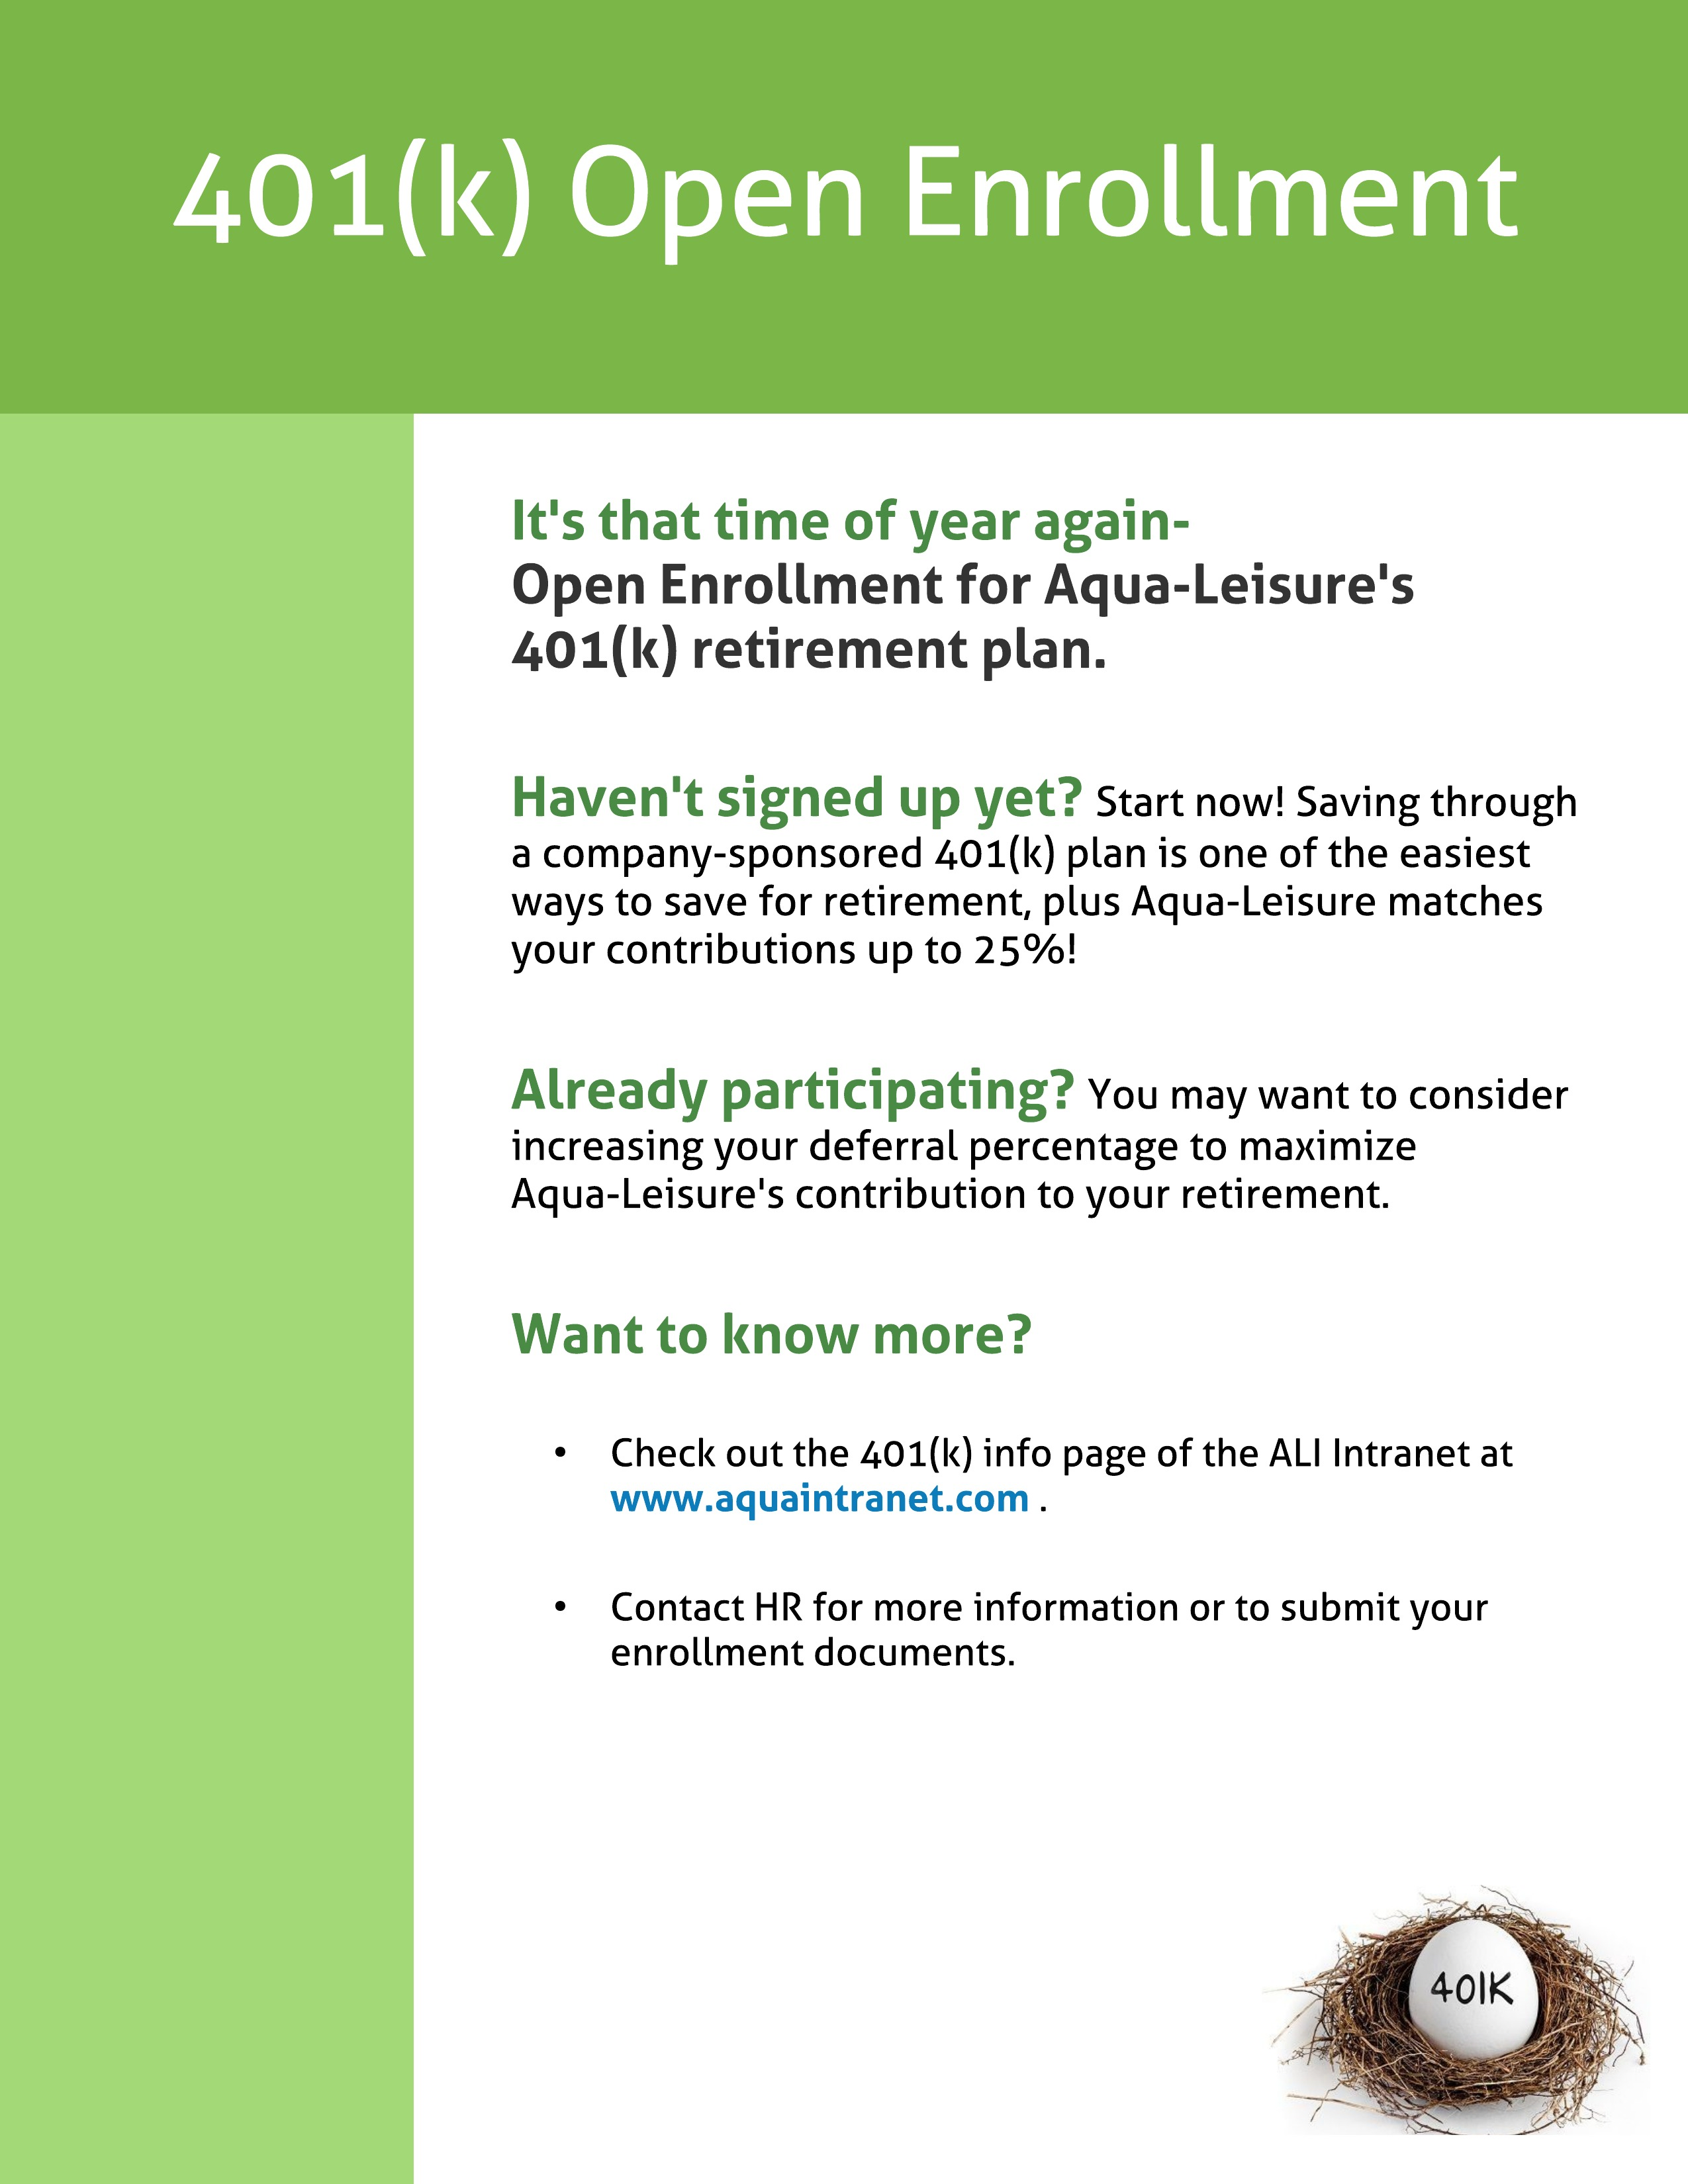 401 k open enrollment is march 24 31 aquaintranet .